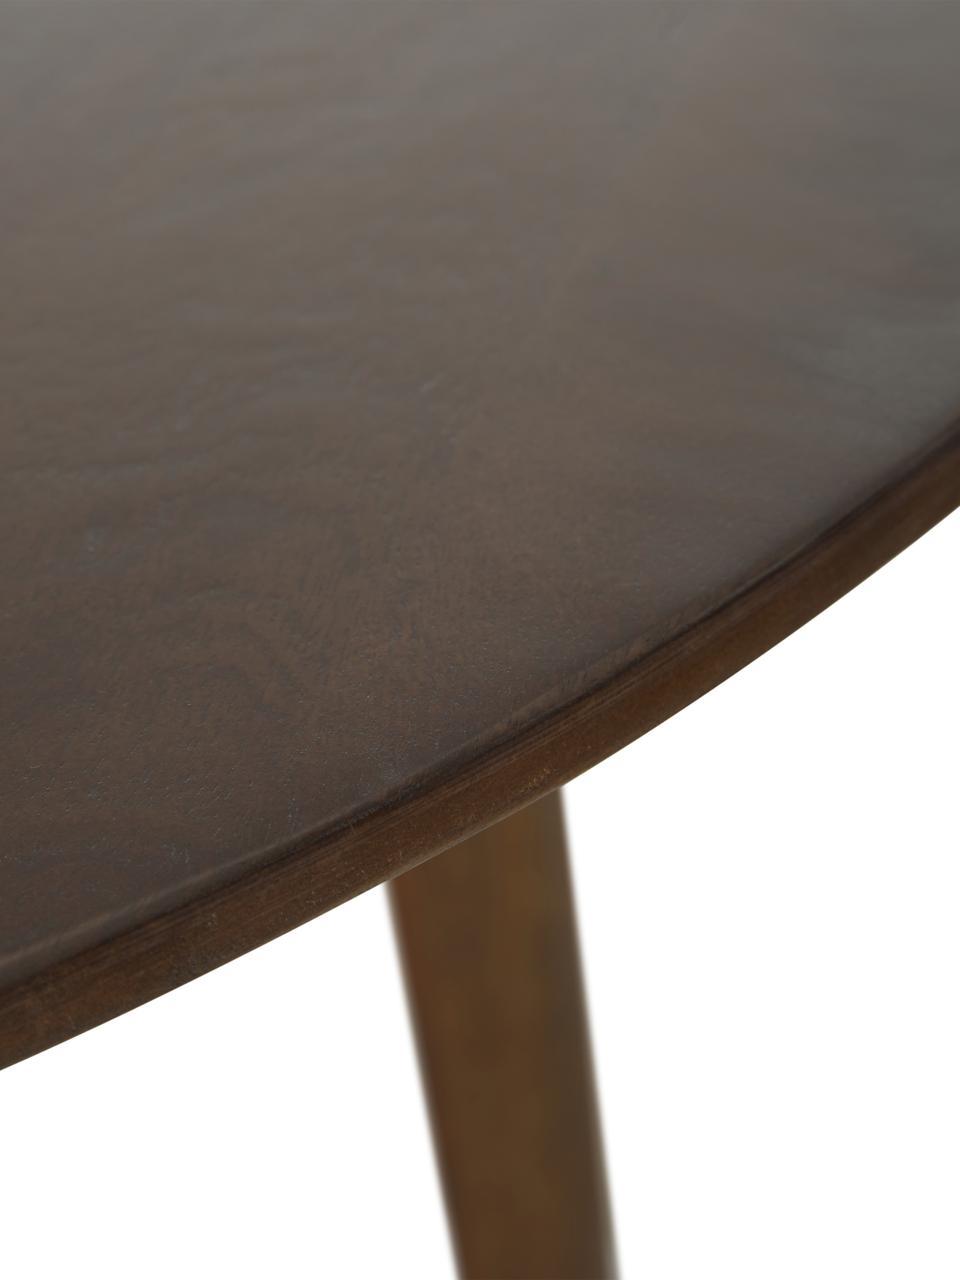 Runder Massivholz Esstisch Archie, Massives Mangoholz, lackiert, Mangoholz, dunkel lackiert, Ø 110 x H 75 cm